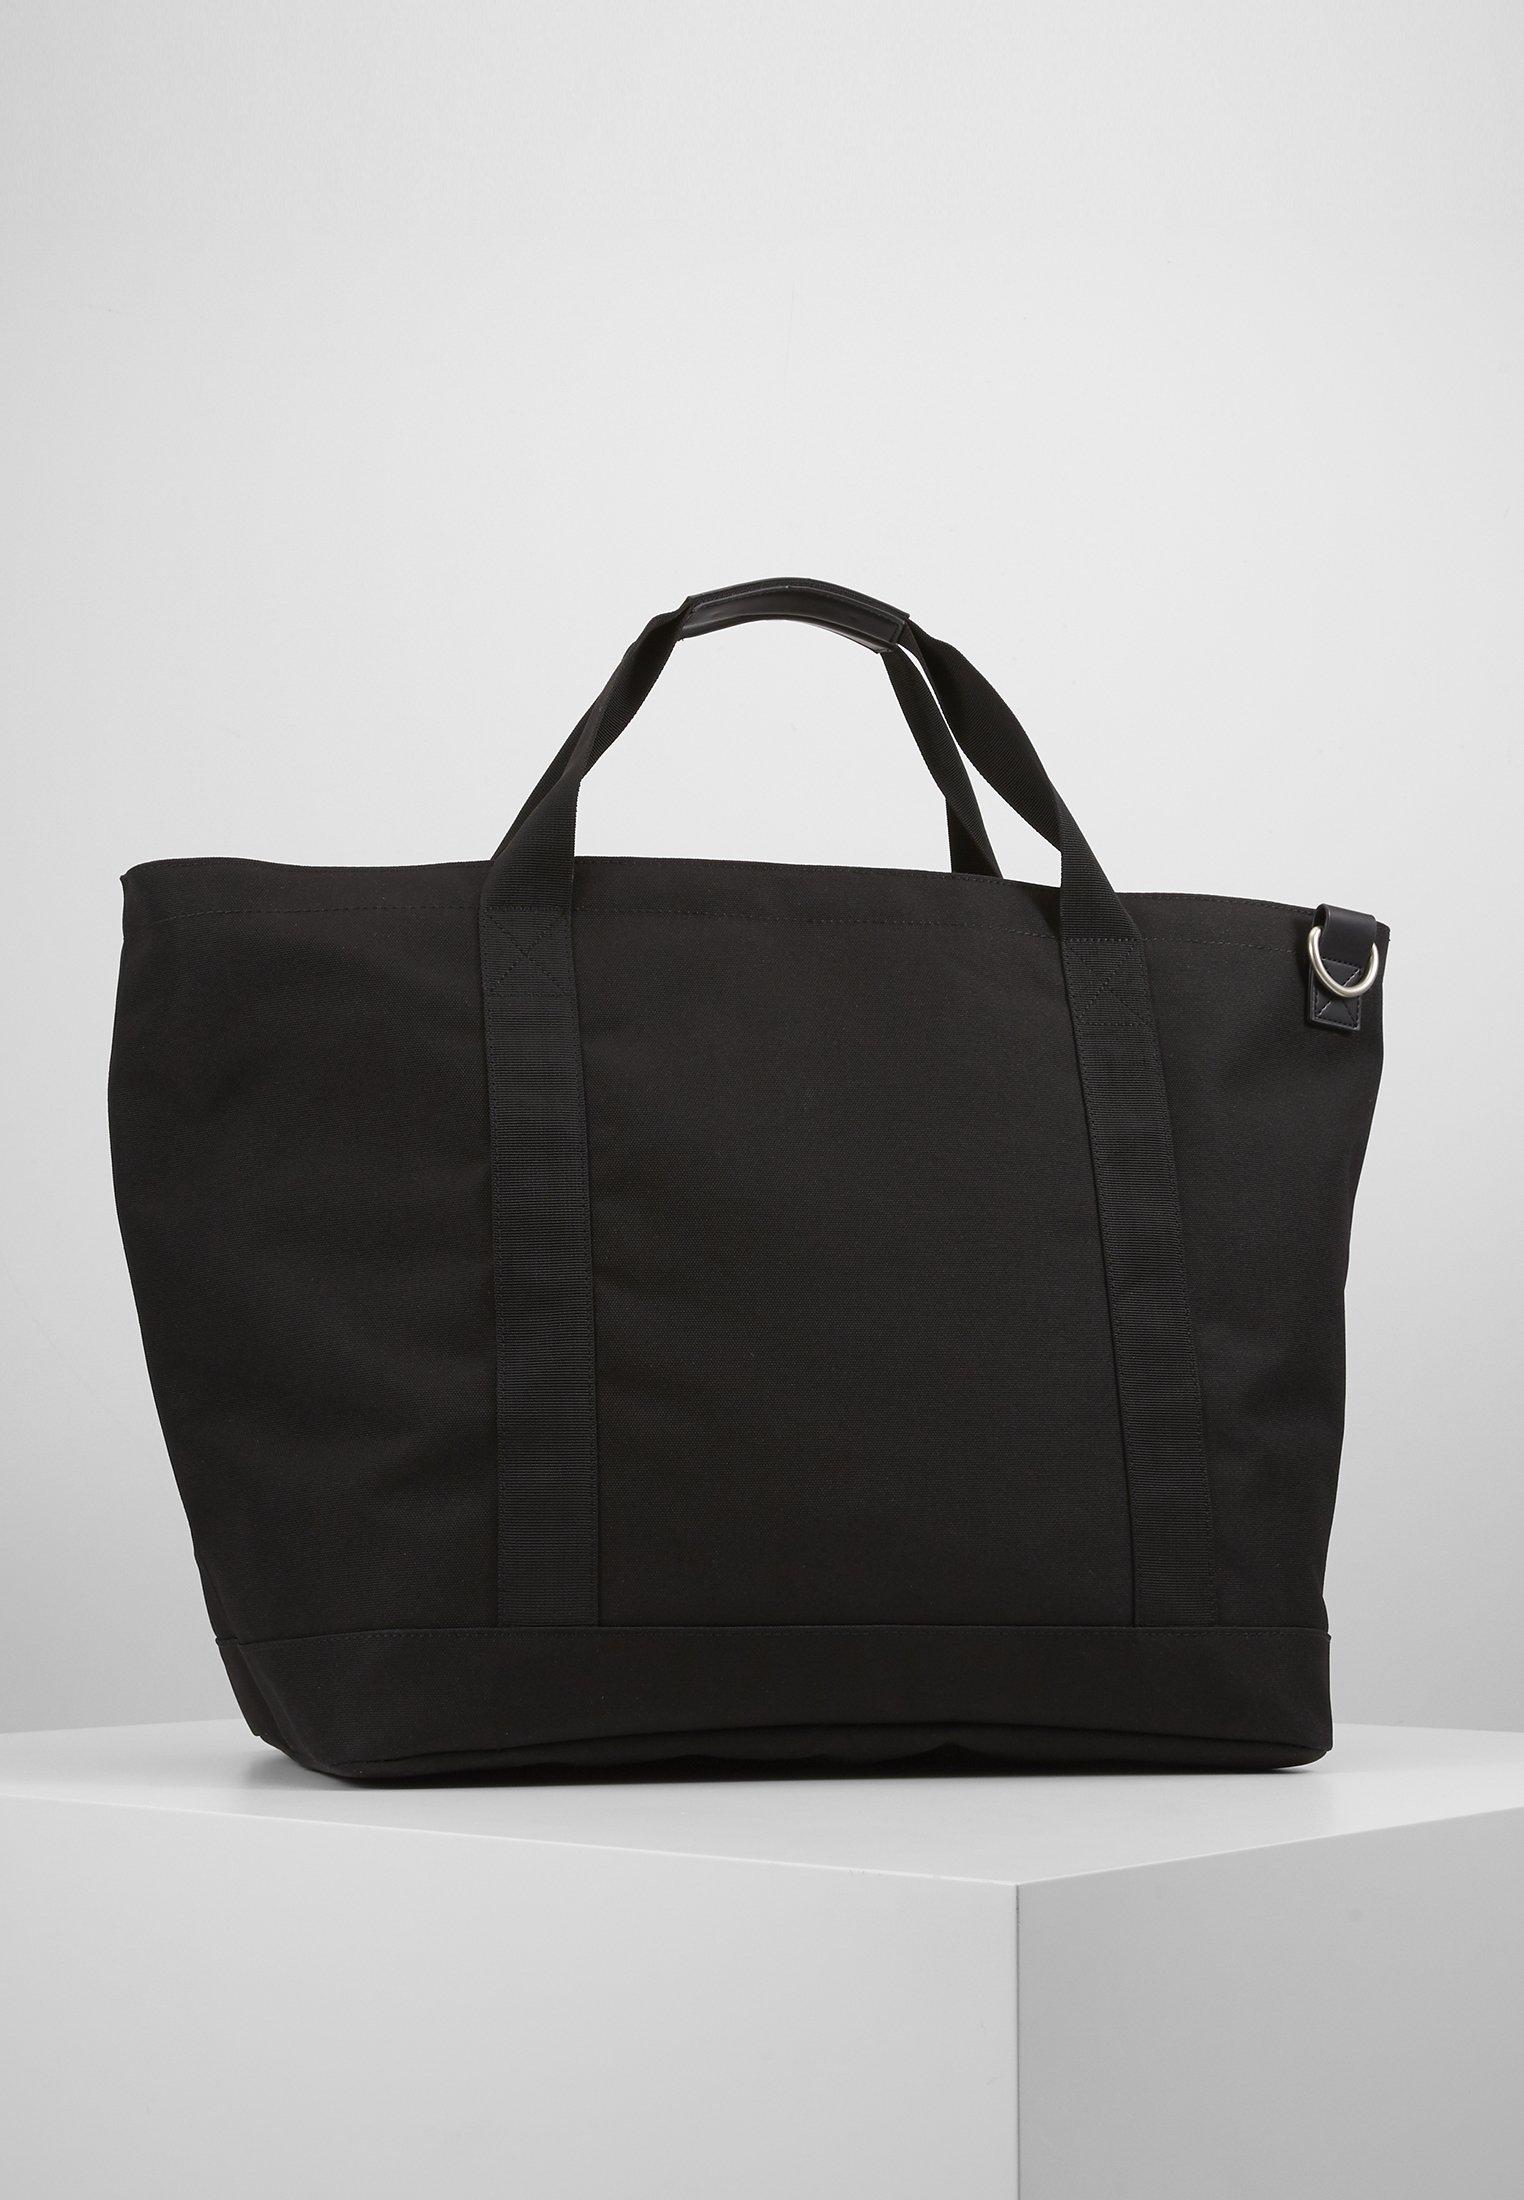 Buy Outlet The Kooples Sports bag - black | men's accessories 2020 sBqcT